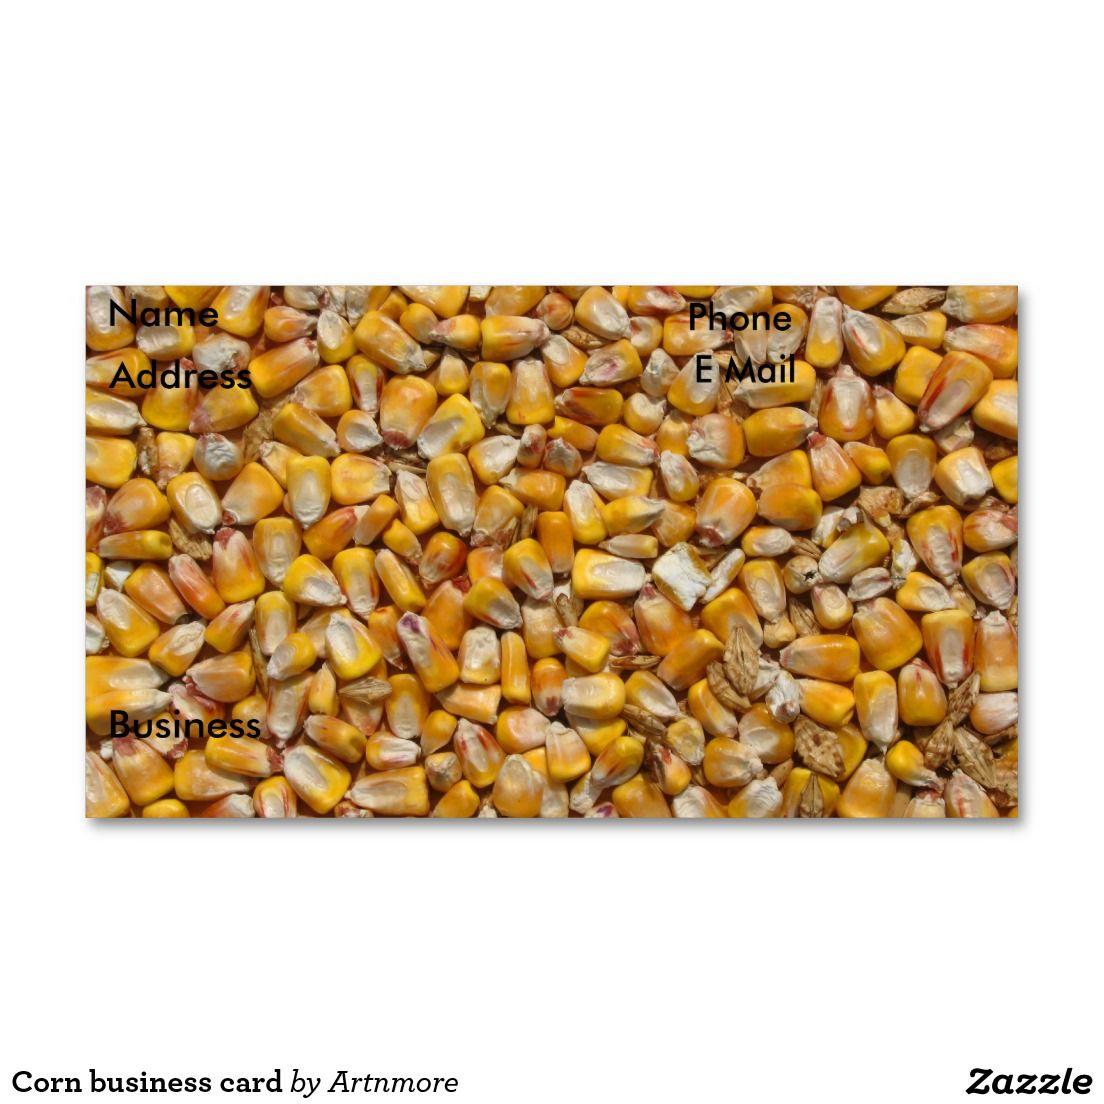 Corn business card